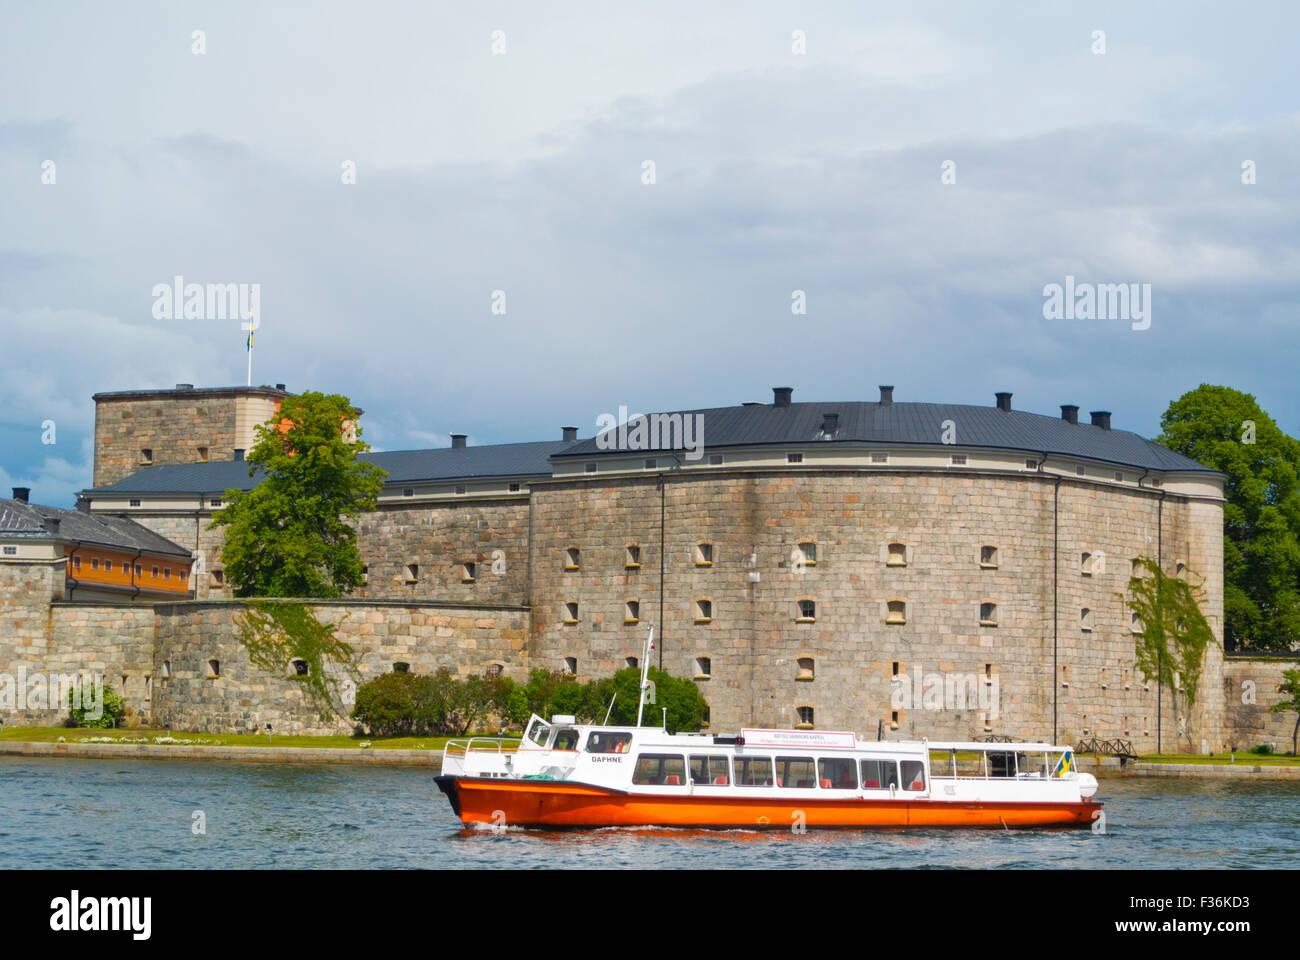 Boat in front of Kastellet, the fortress, Vaxholmen island, Vaxholm, near Stockholm, Sweden - Stock Image